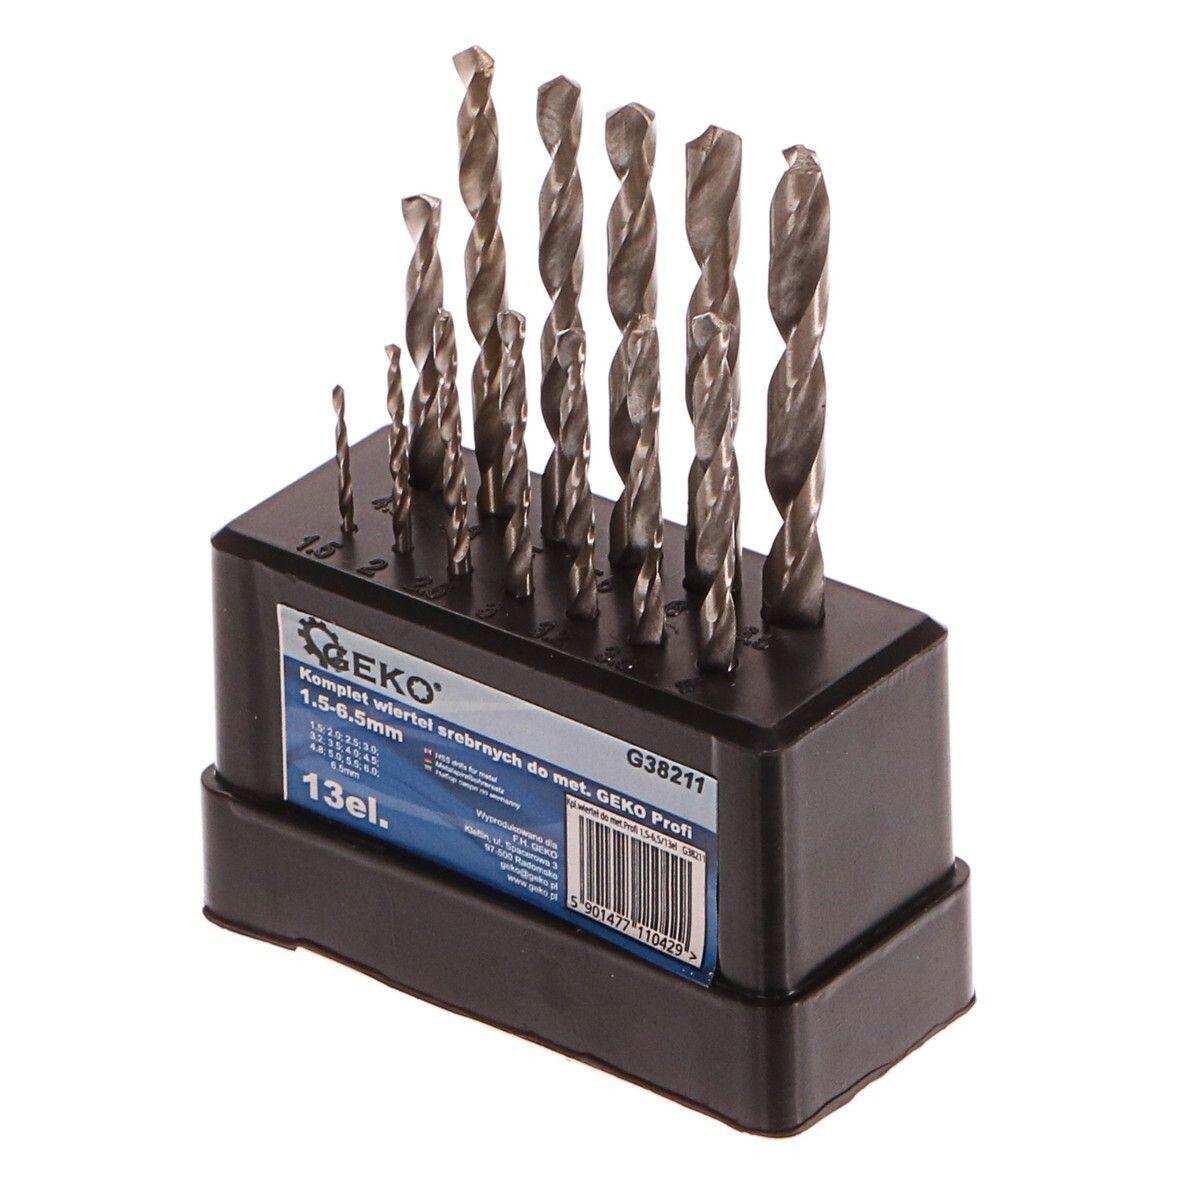 Vrtáky do kovu, sada 13ks, 1,5-6,5mm, HSS TiN, GEKO PROFI G38211